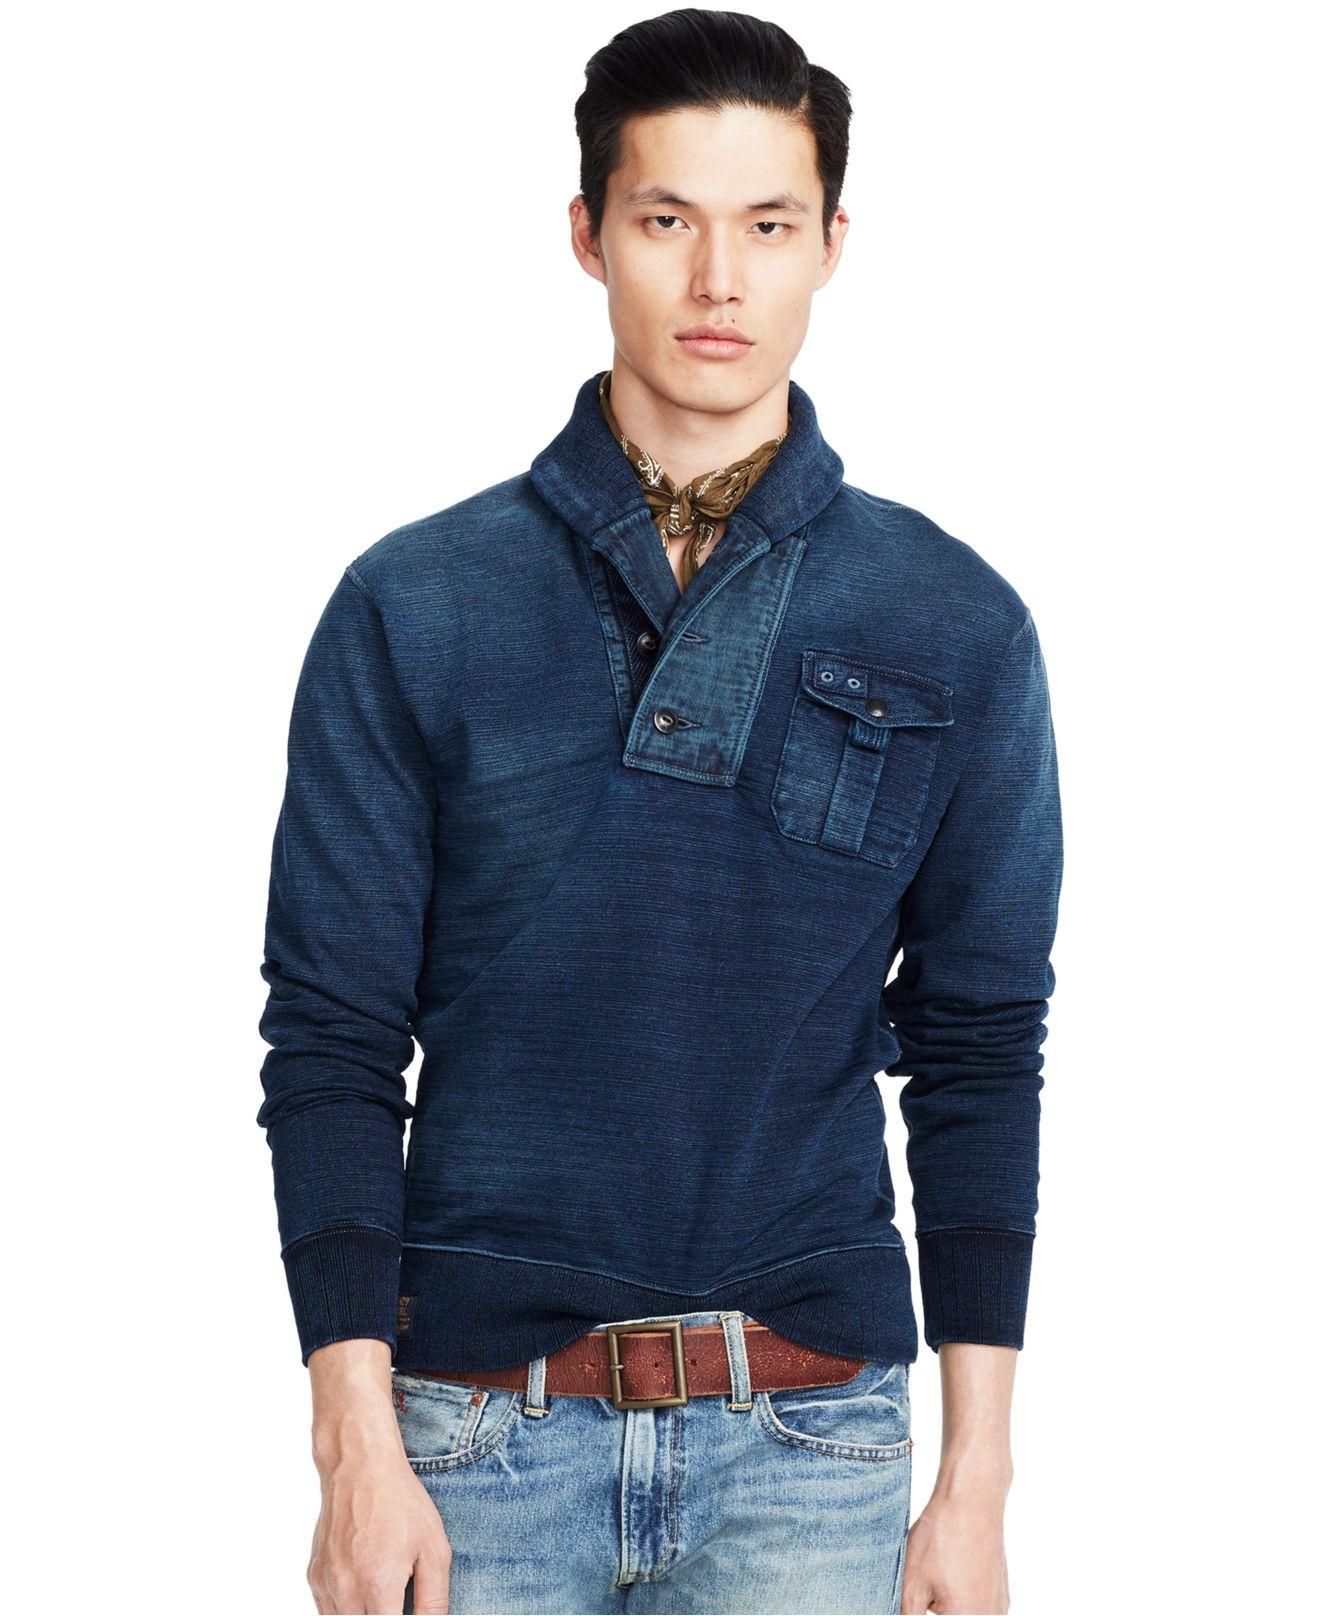 lyst polo ralph lauren fleece shawl pullover in blue for men. Black Bedroom Furniture Sets. Home Design Ideas